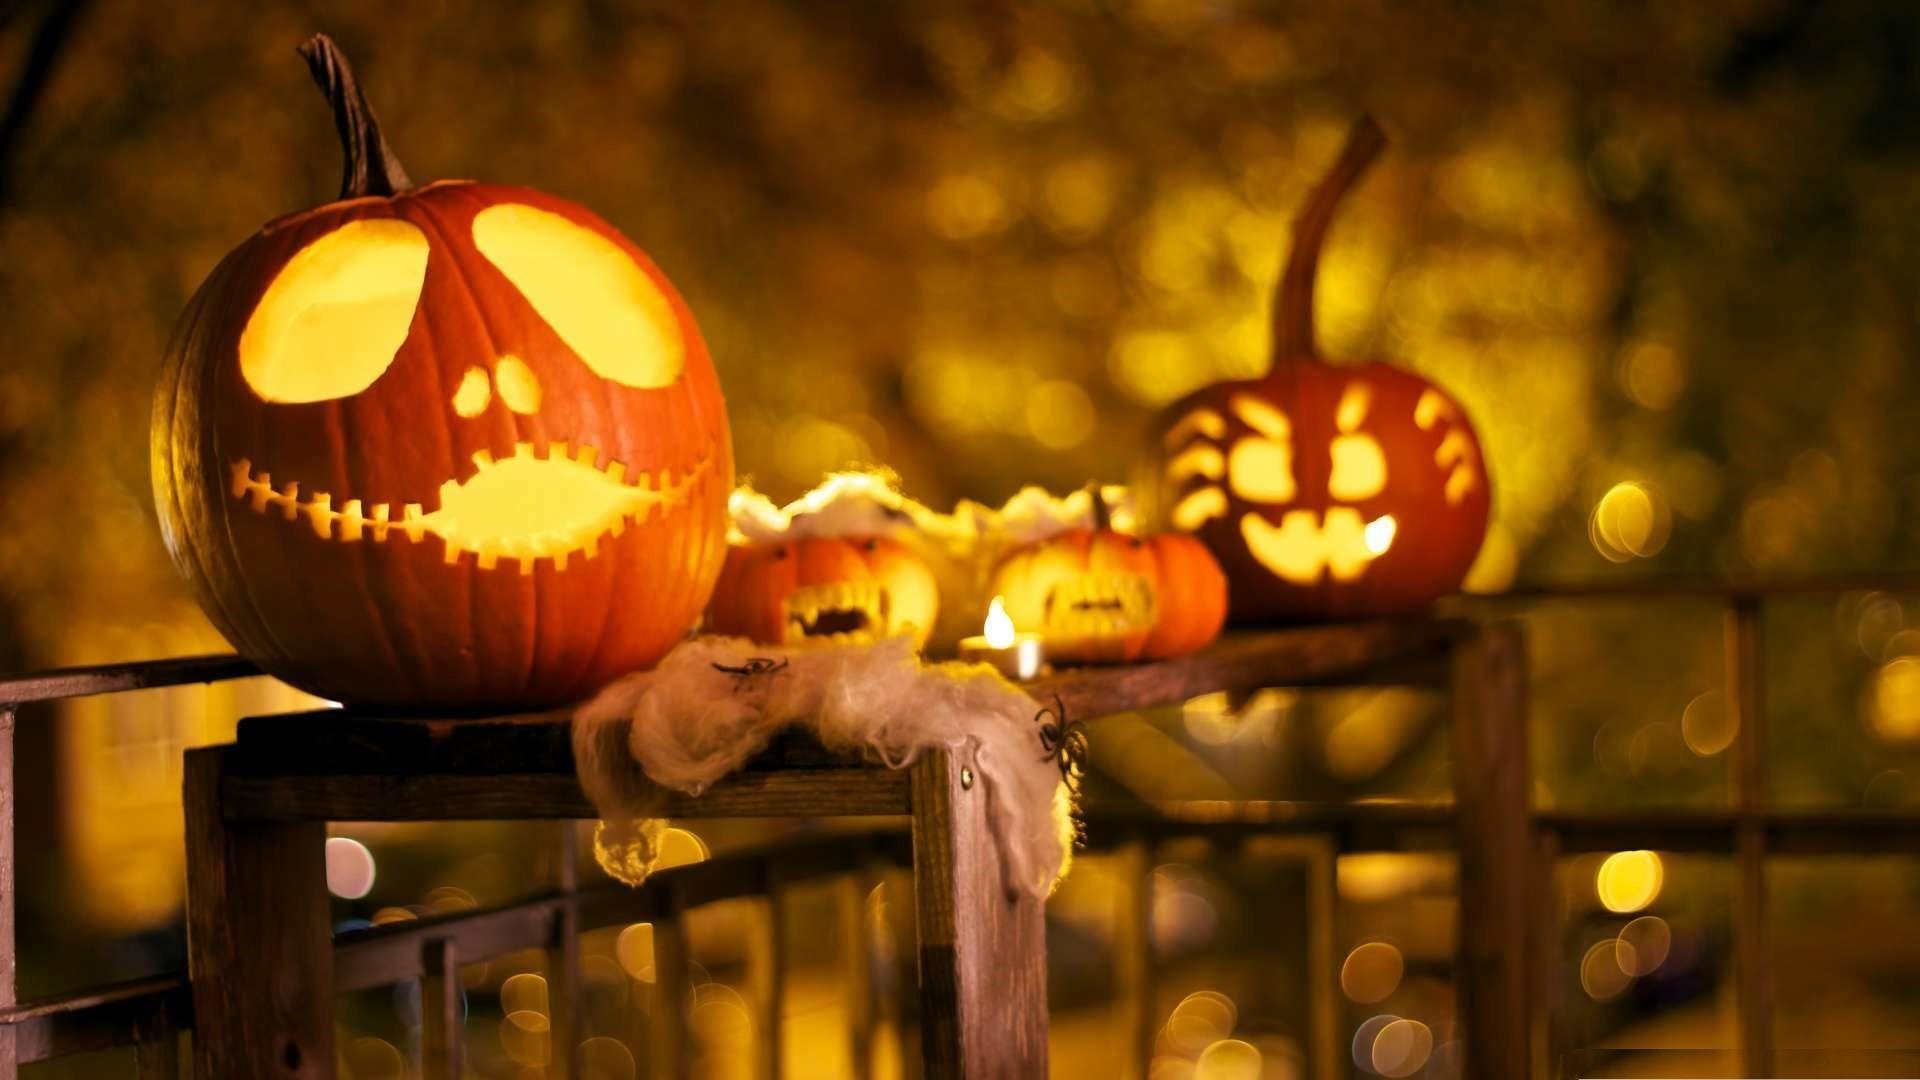 Halloween decorations wallpaper 1080p HD.